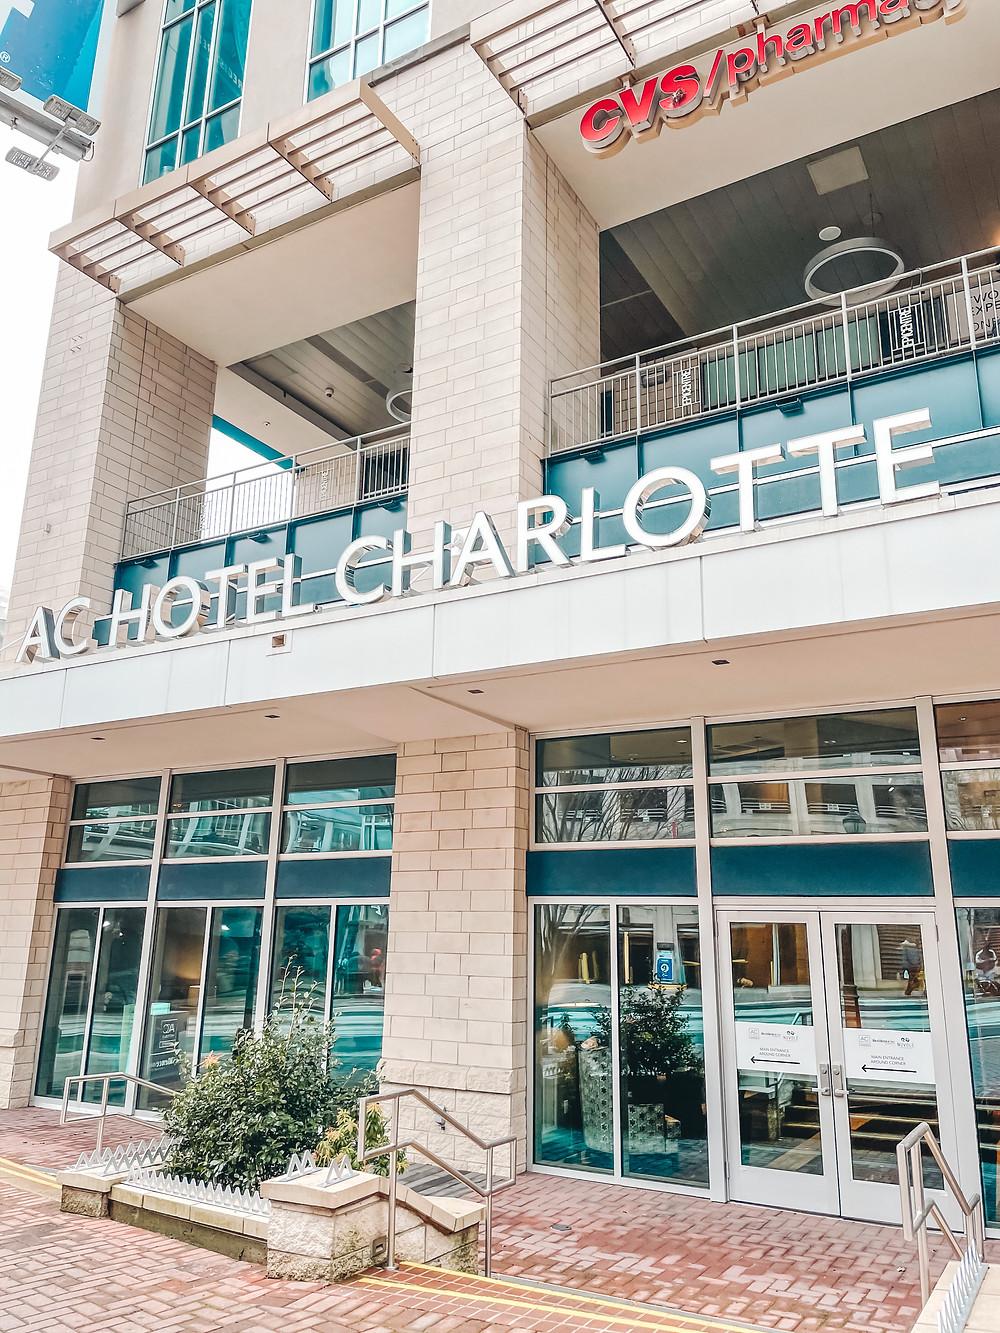 AC Hotel Charlotte